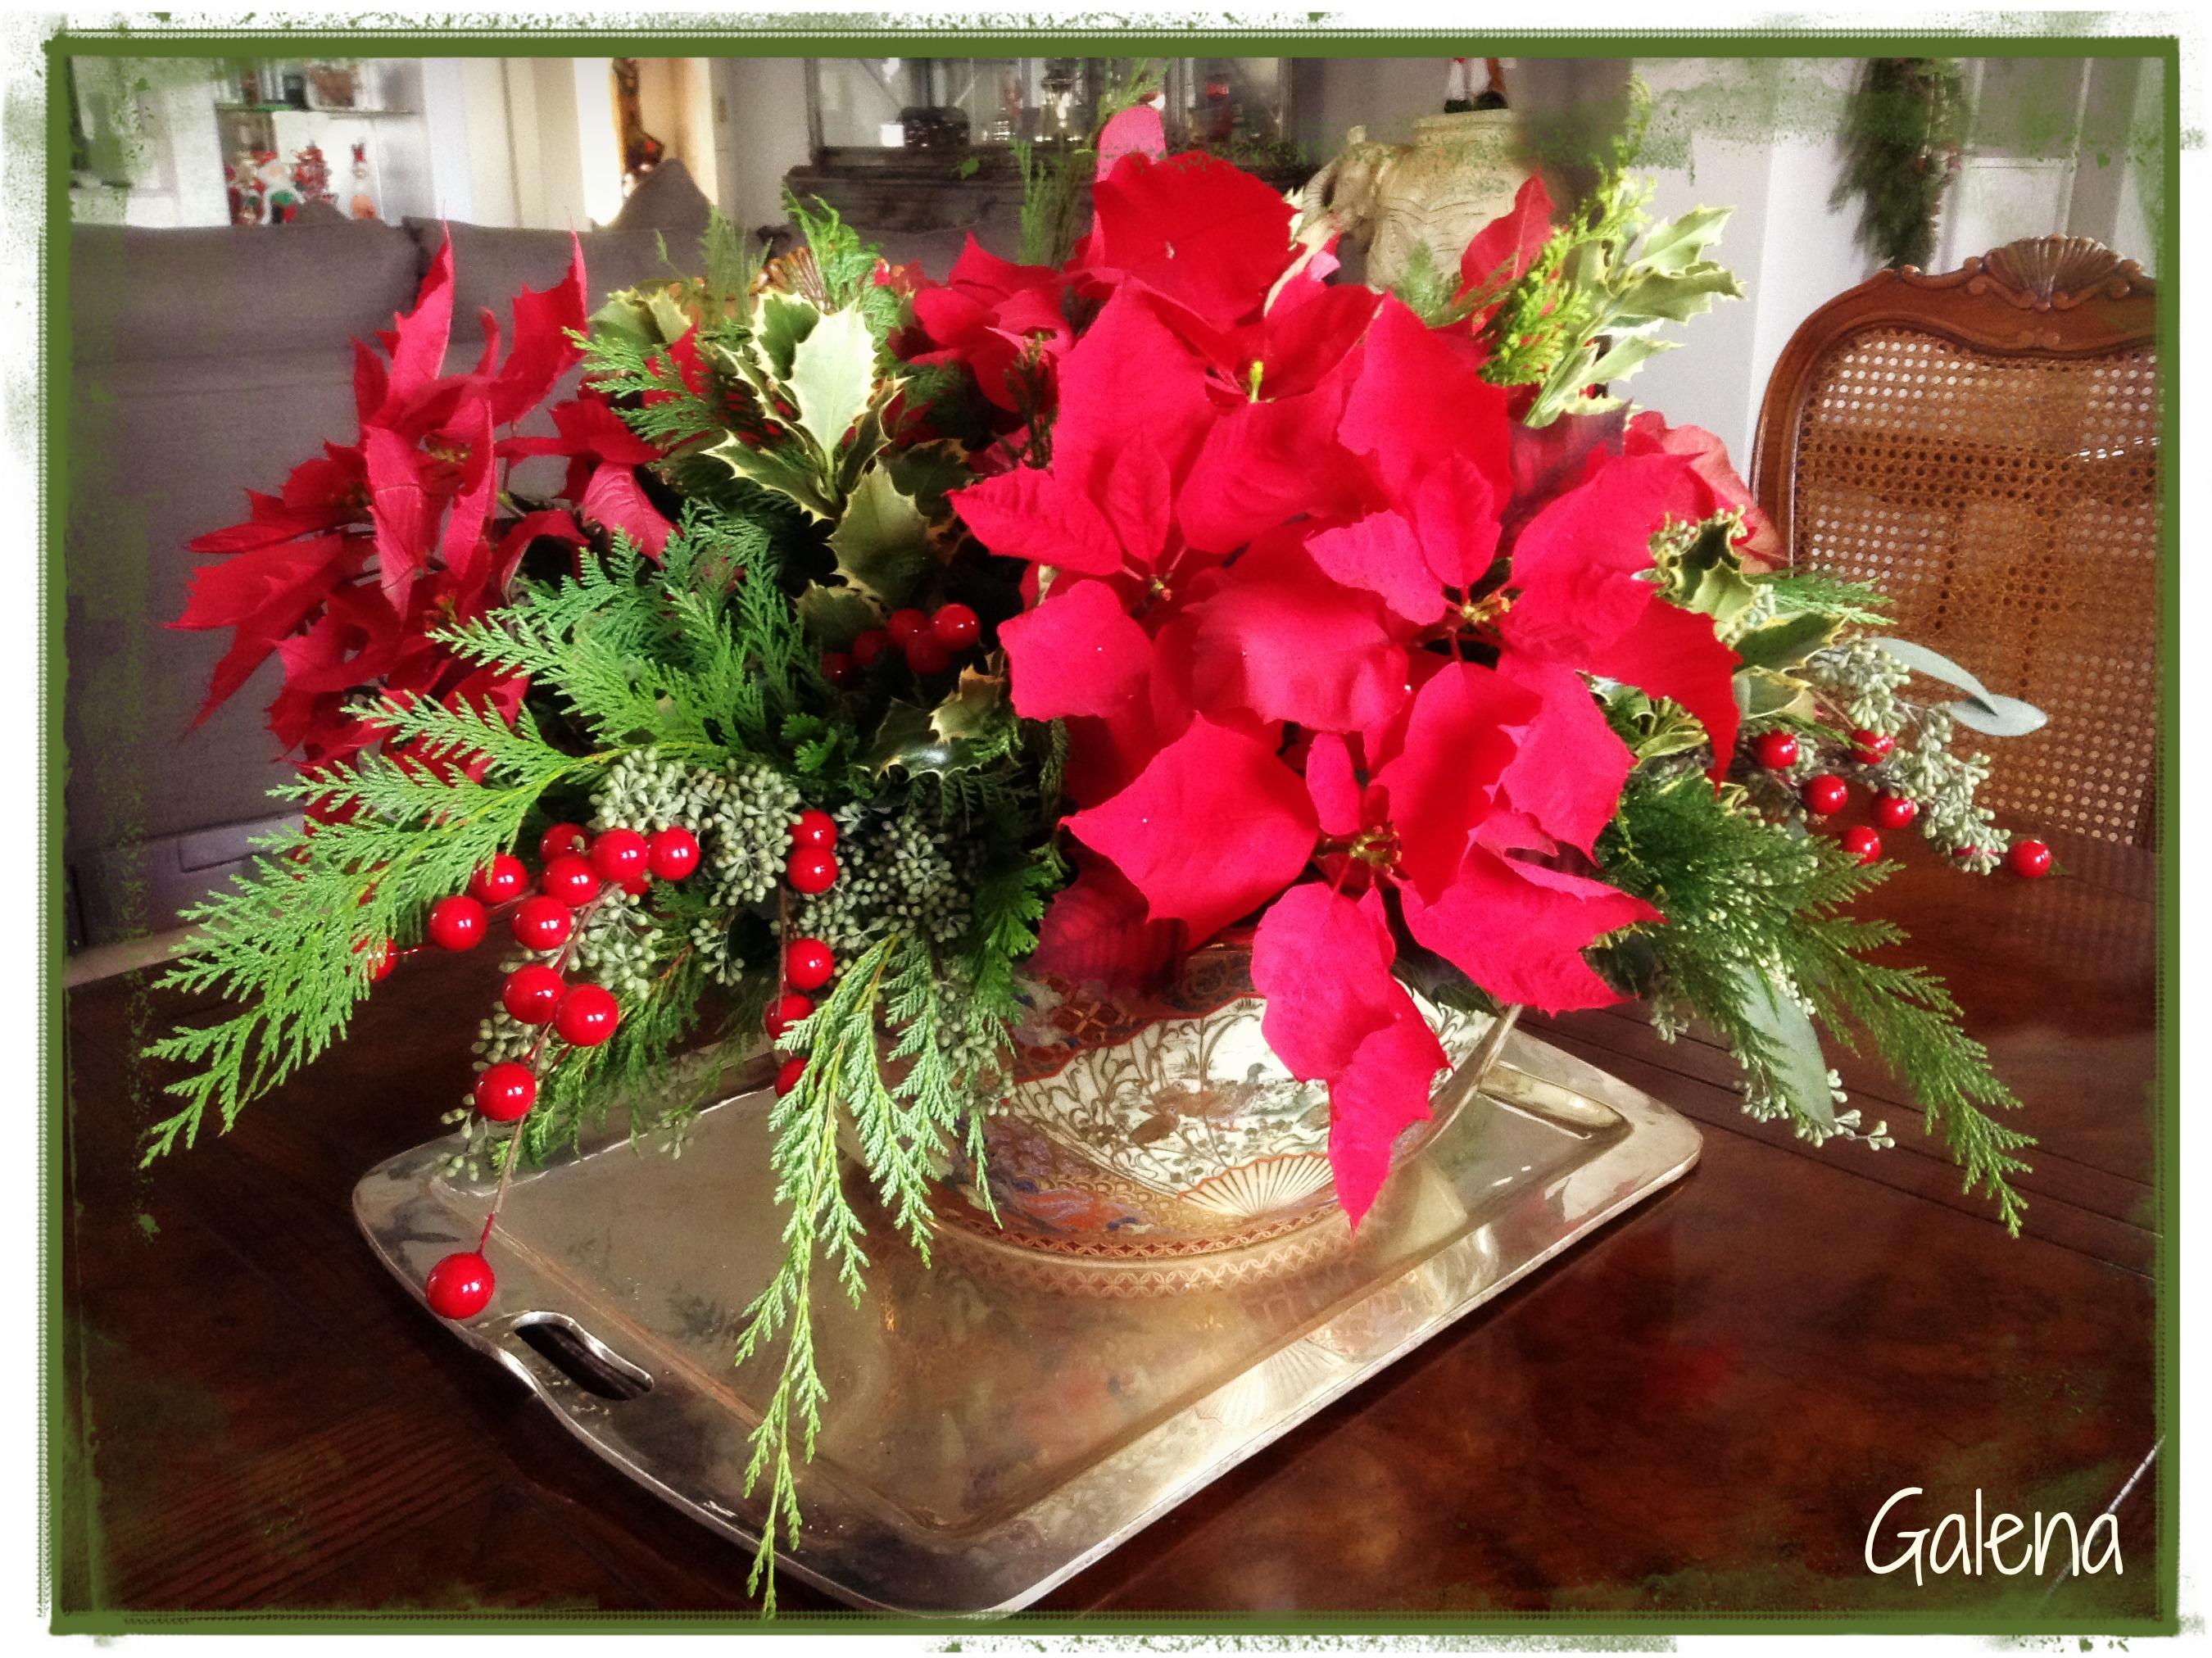 Centro de mesa con nochebuenas ana galena for Adornos con plantas de nochebuena